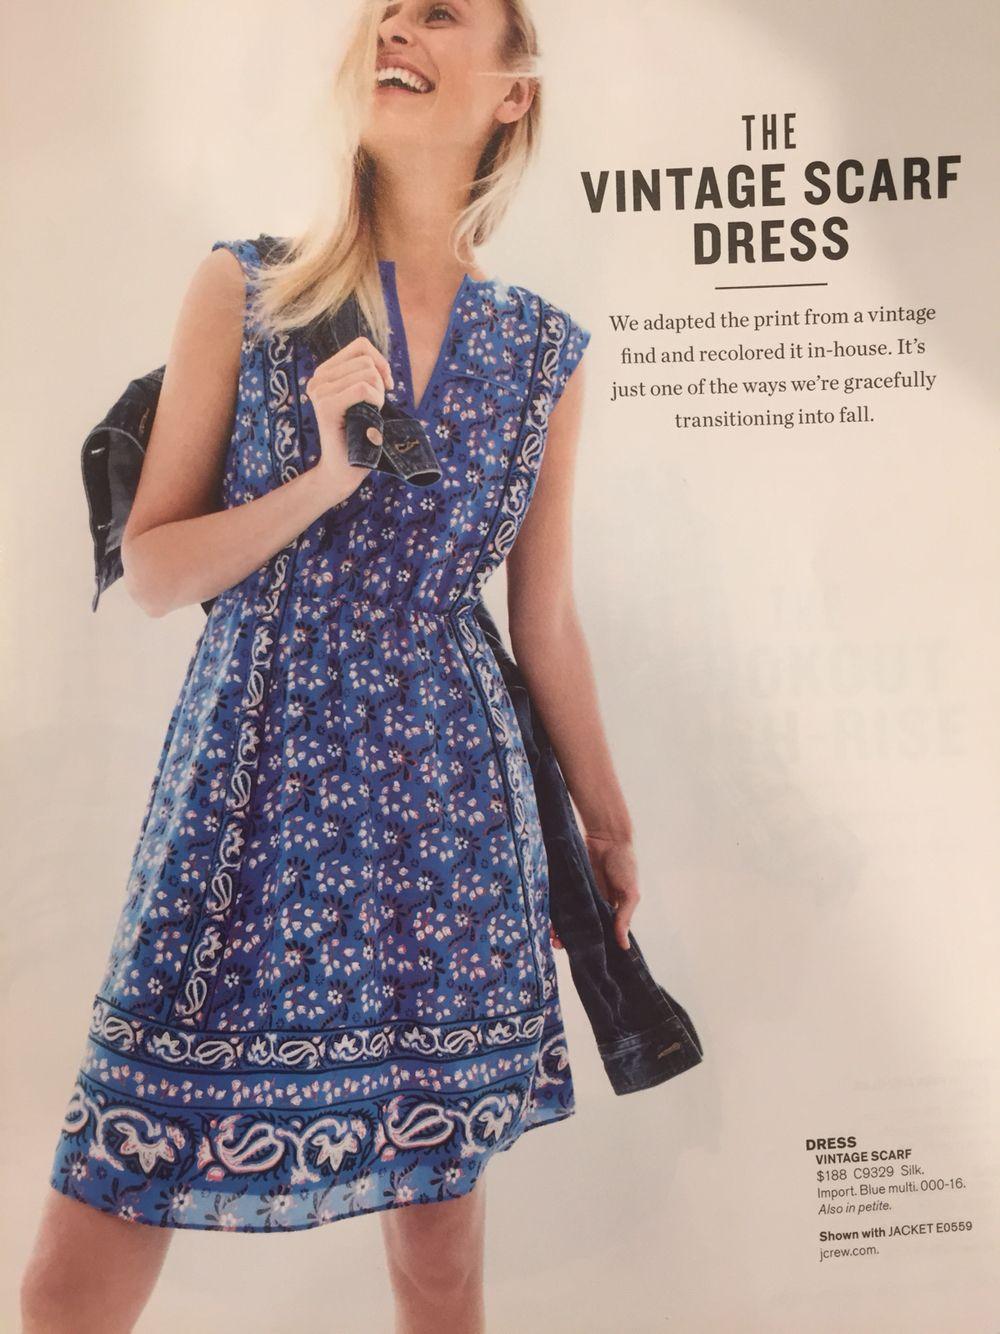 J Crew Vintage Scarf Dress